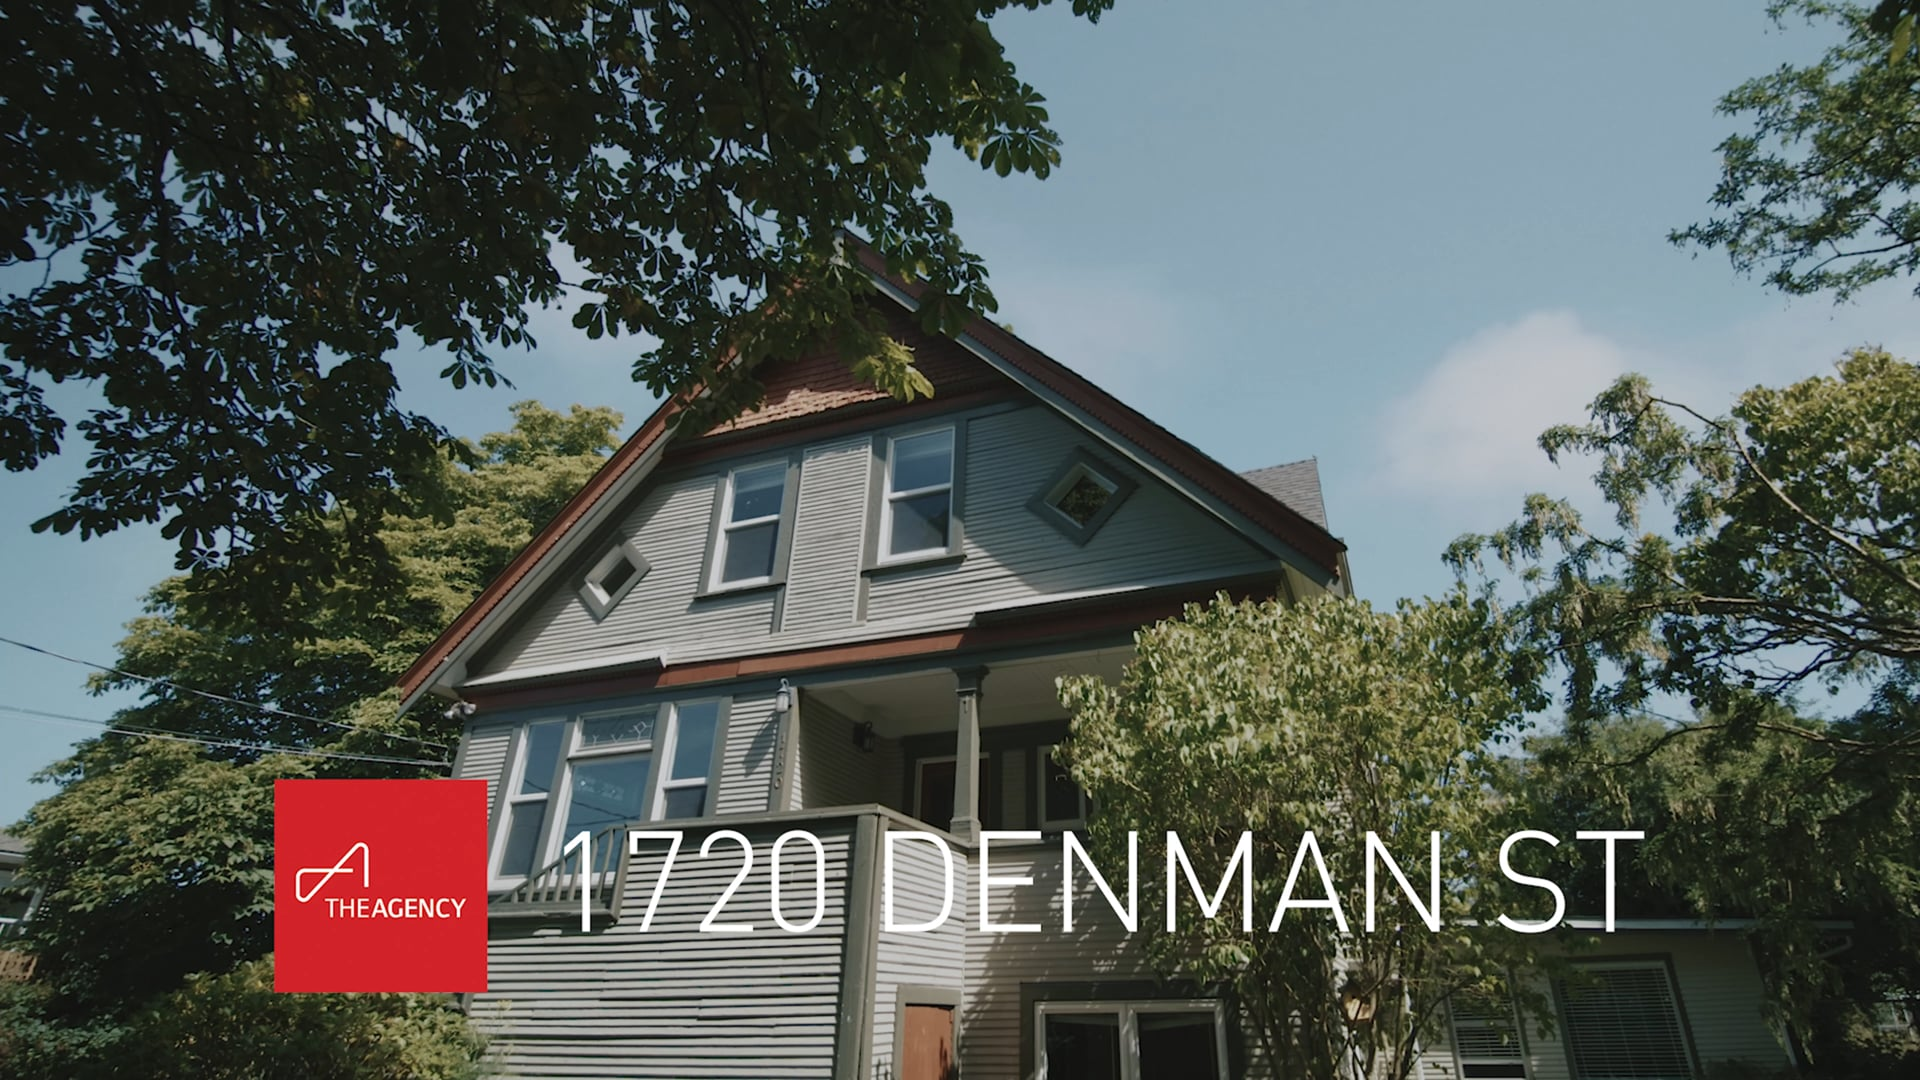 1720 Denman Street - SOLD!